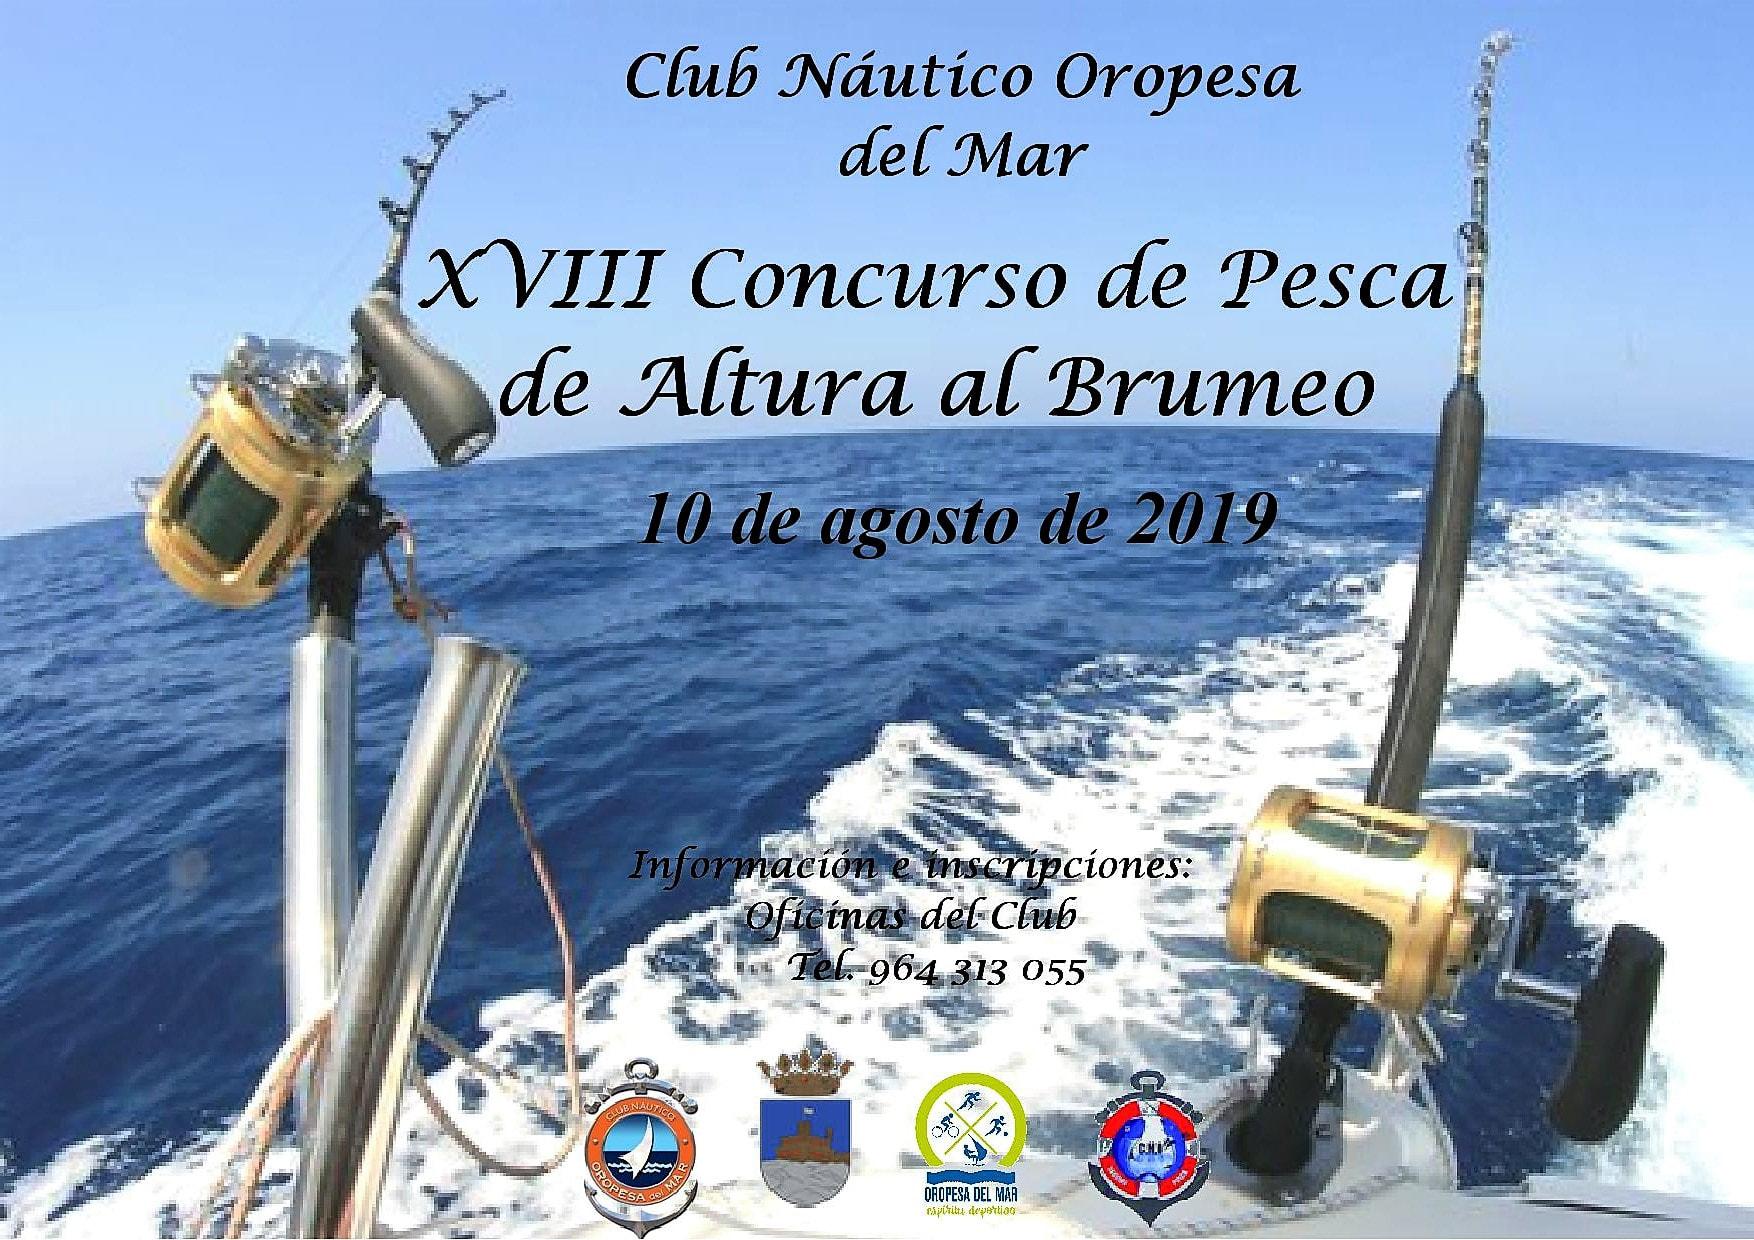 brumeo2019 - XVIII CONCURSO DE PESCA DE ALTURA AL BRUMEO.